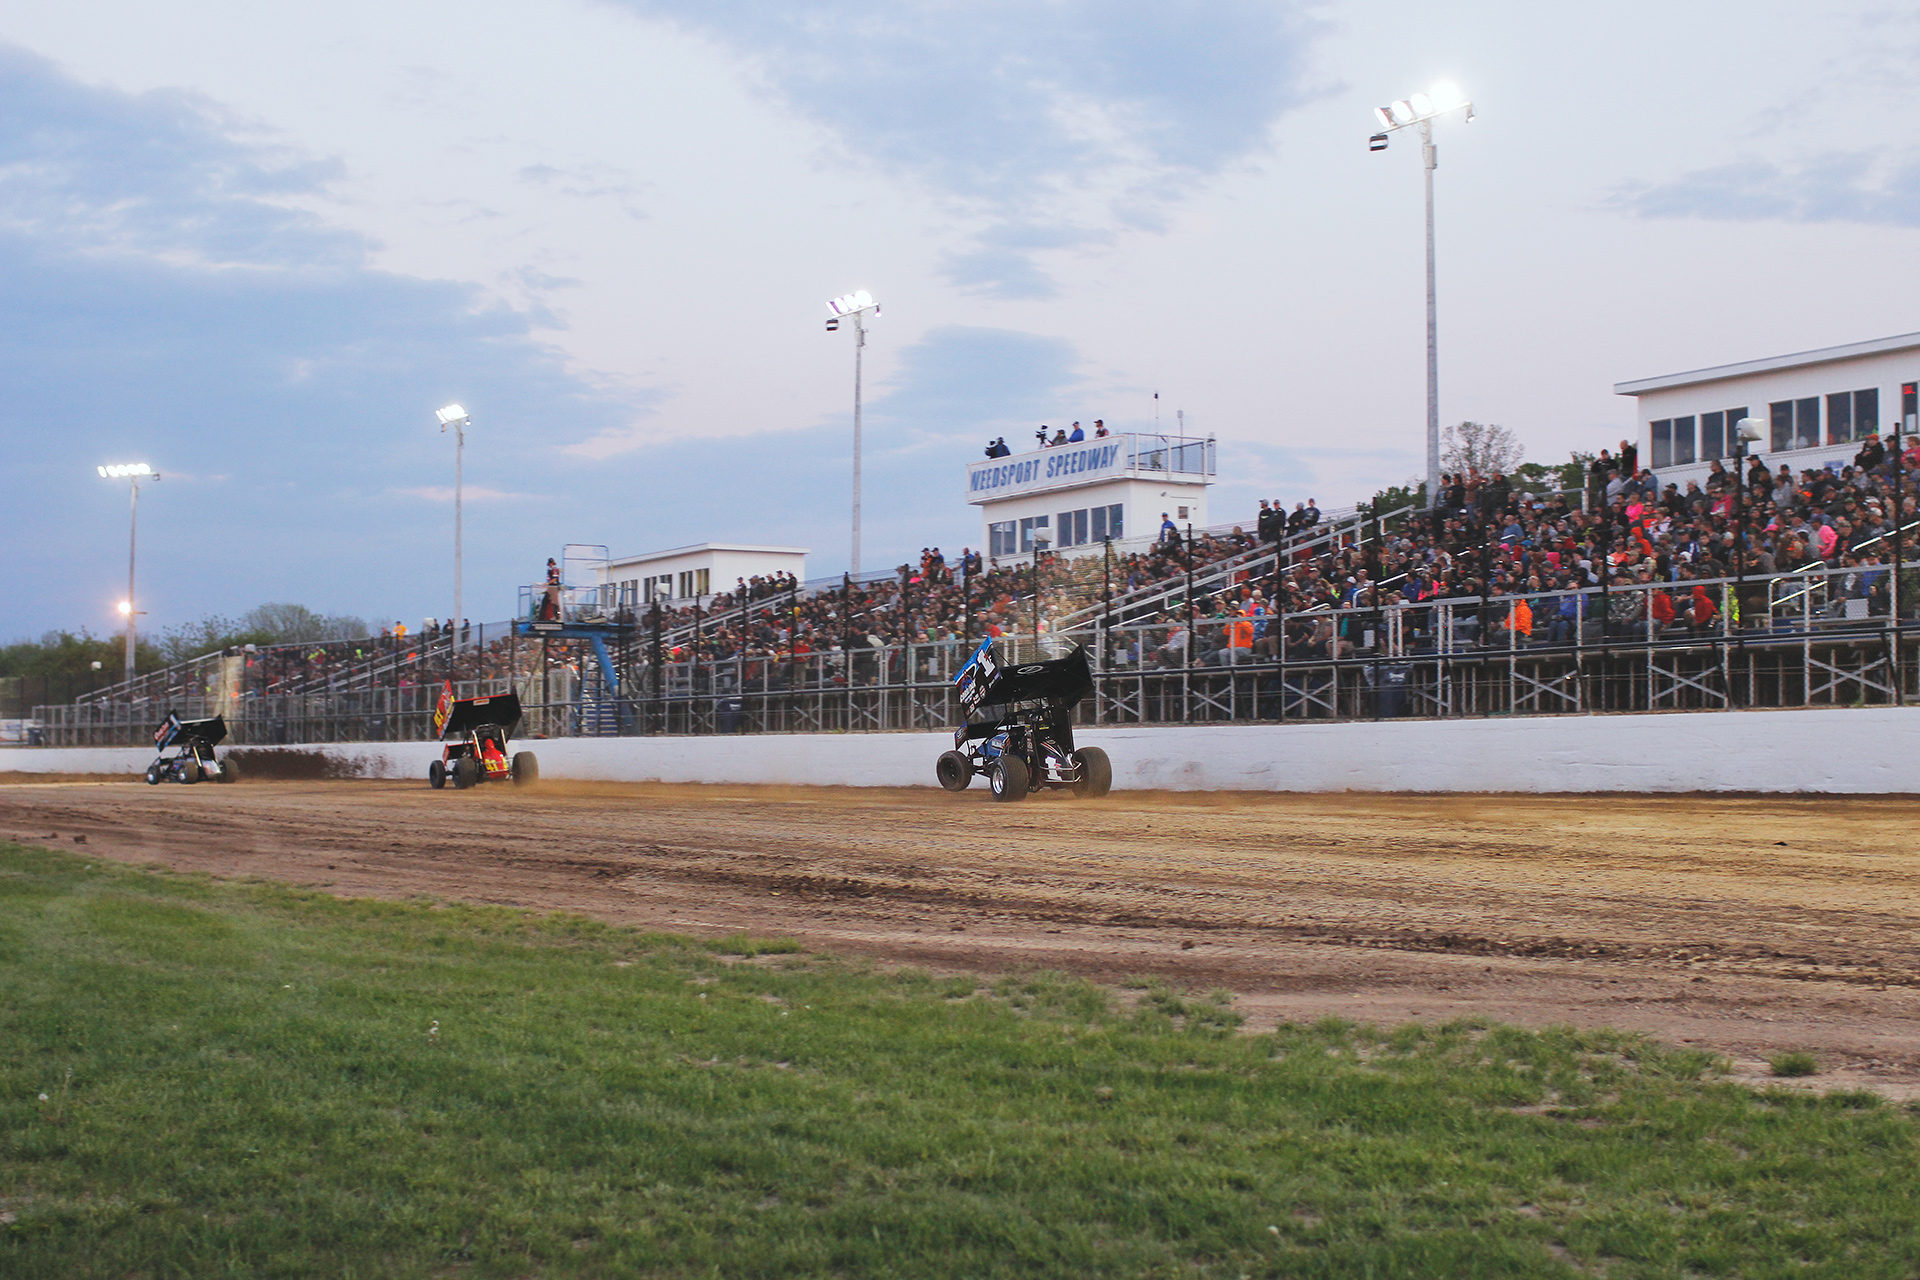 DIRT Modified star Stewart Friesen wheelie's during World of Outlaws heat race action Weedsport Speedway. ( Jeffrey Turford / TDP )